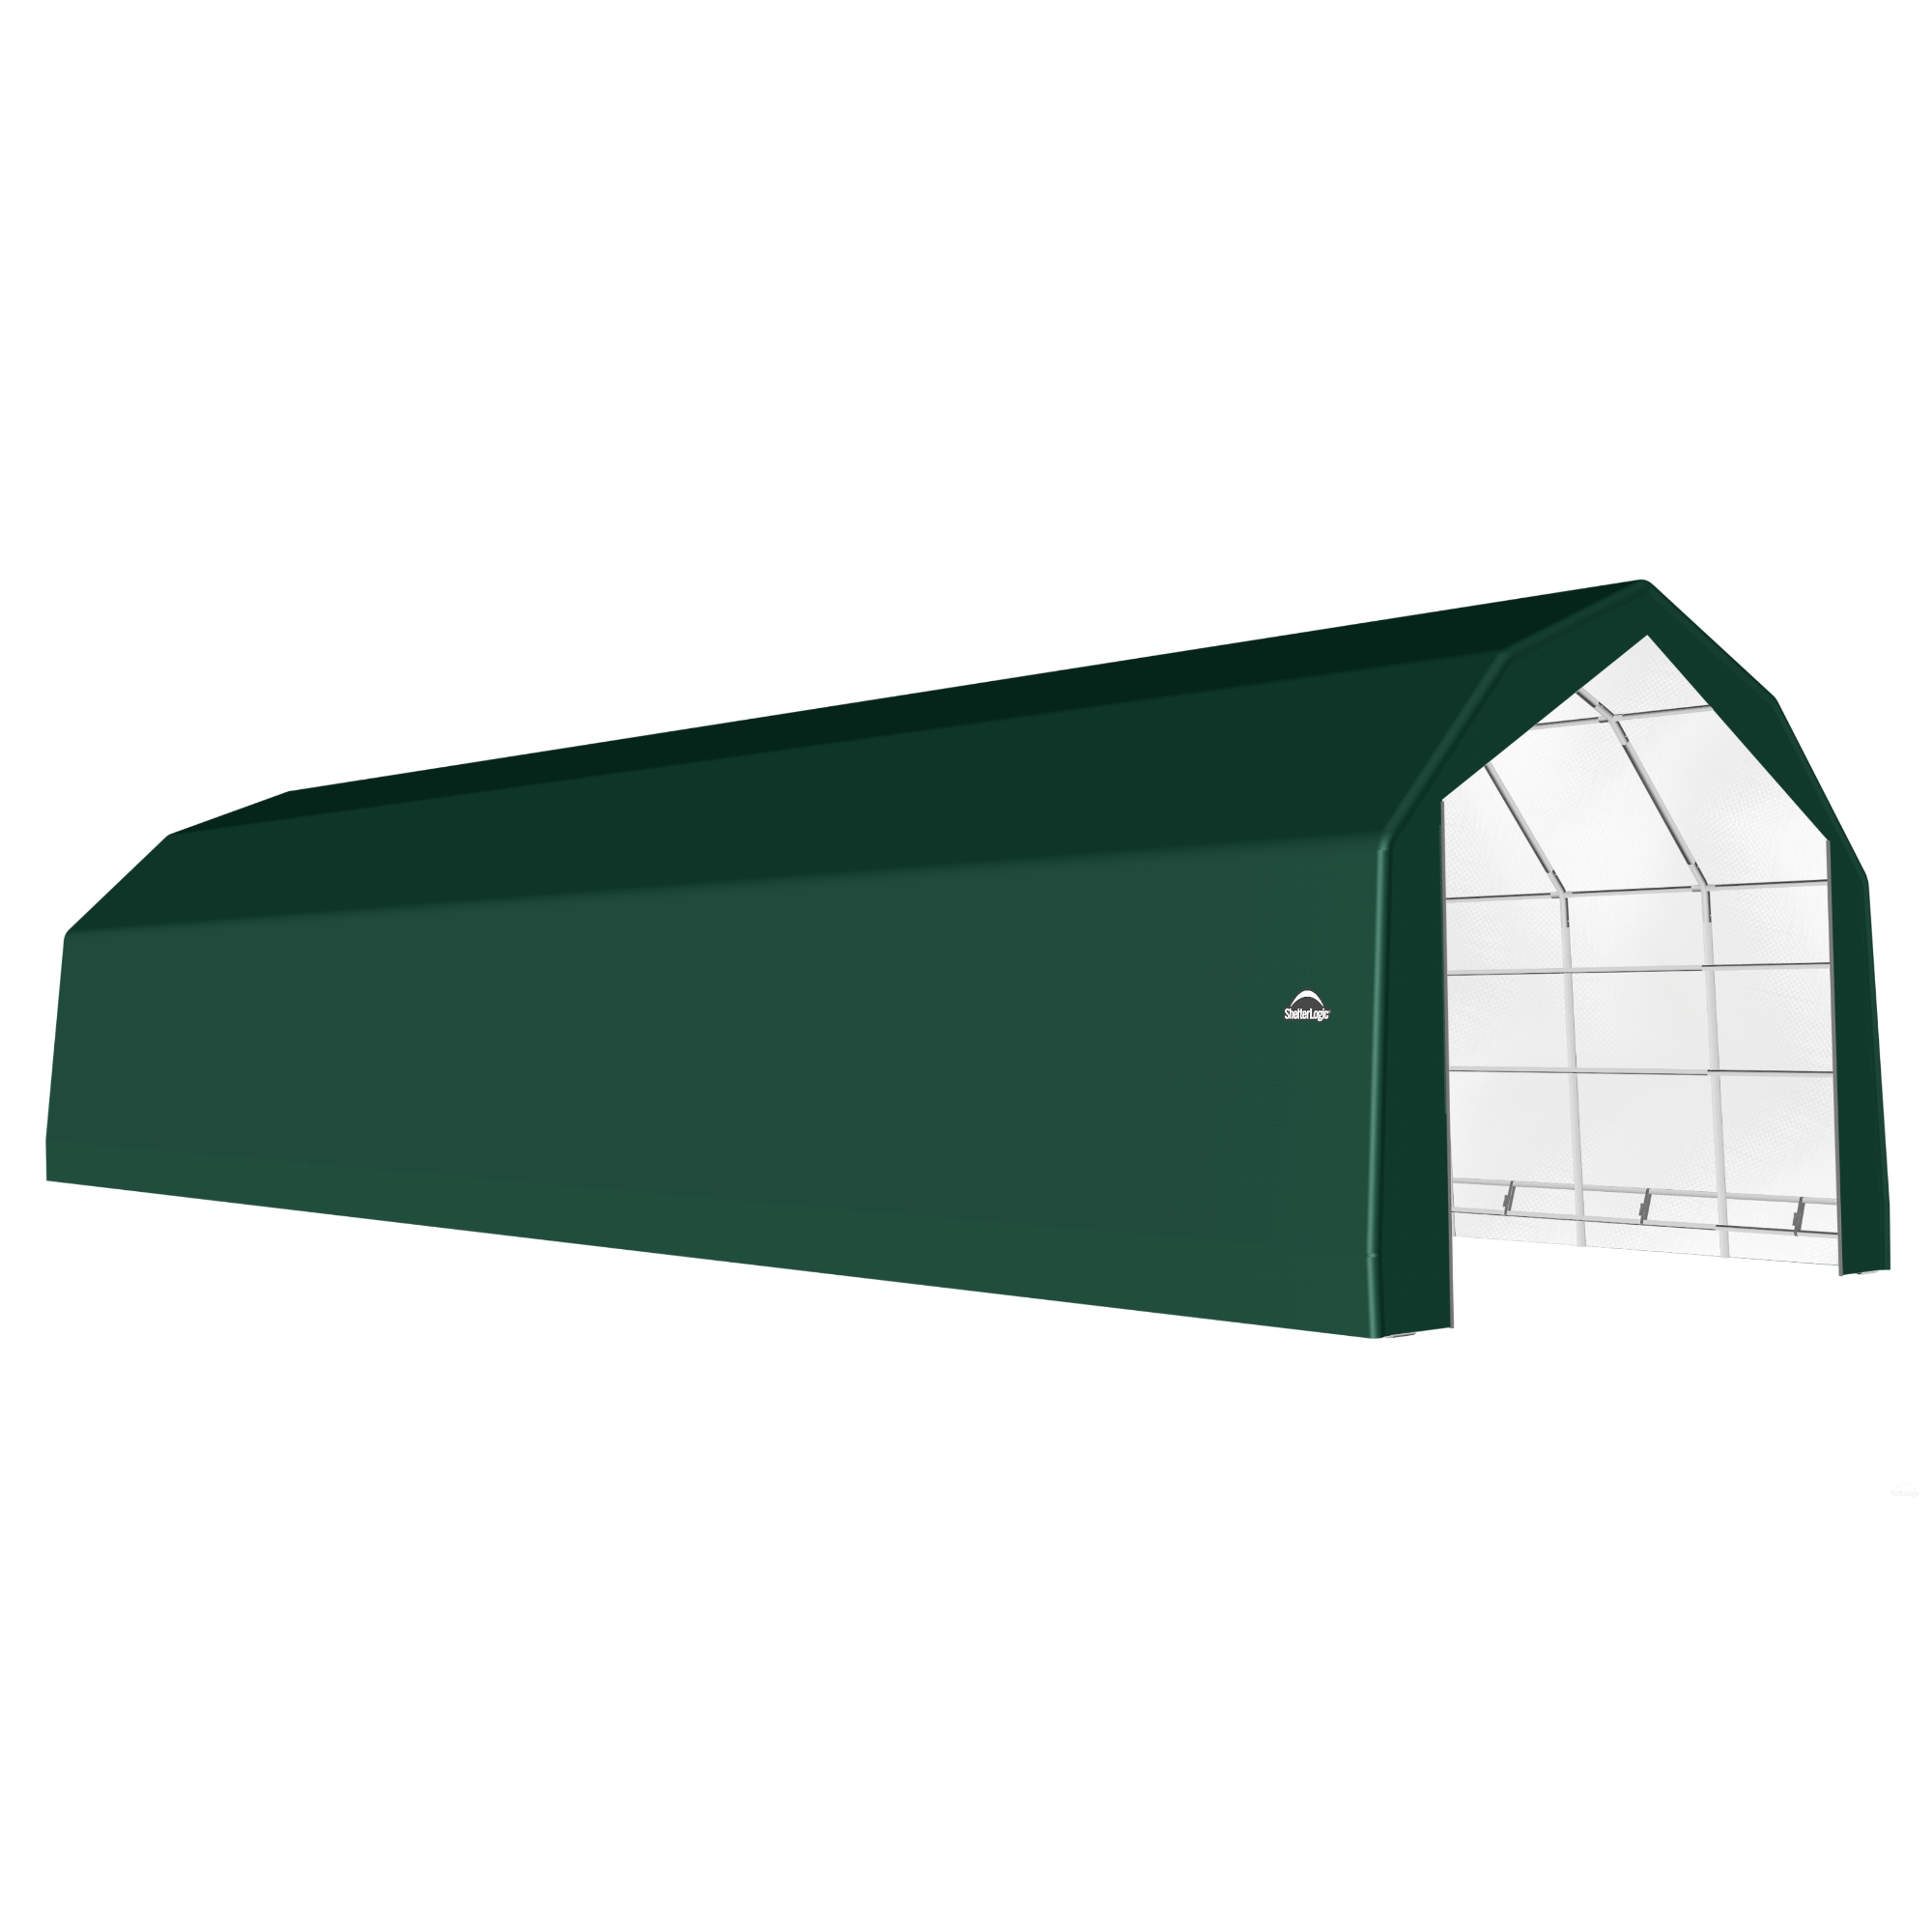 SP Barn 20X52X15 Green 14 oz PE Shelter